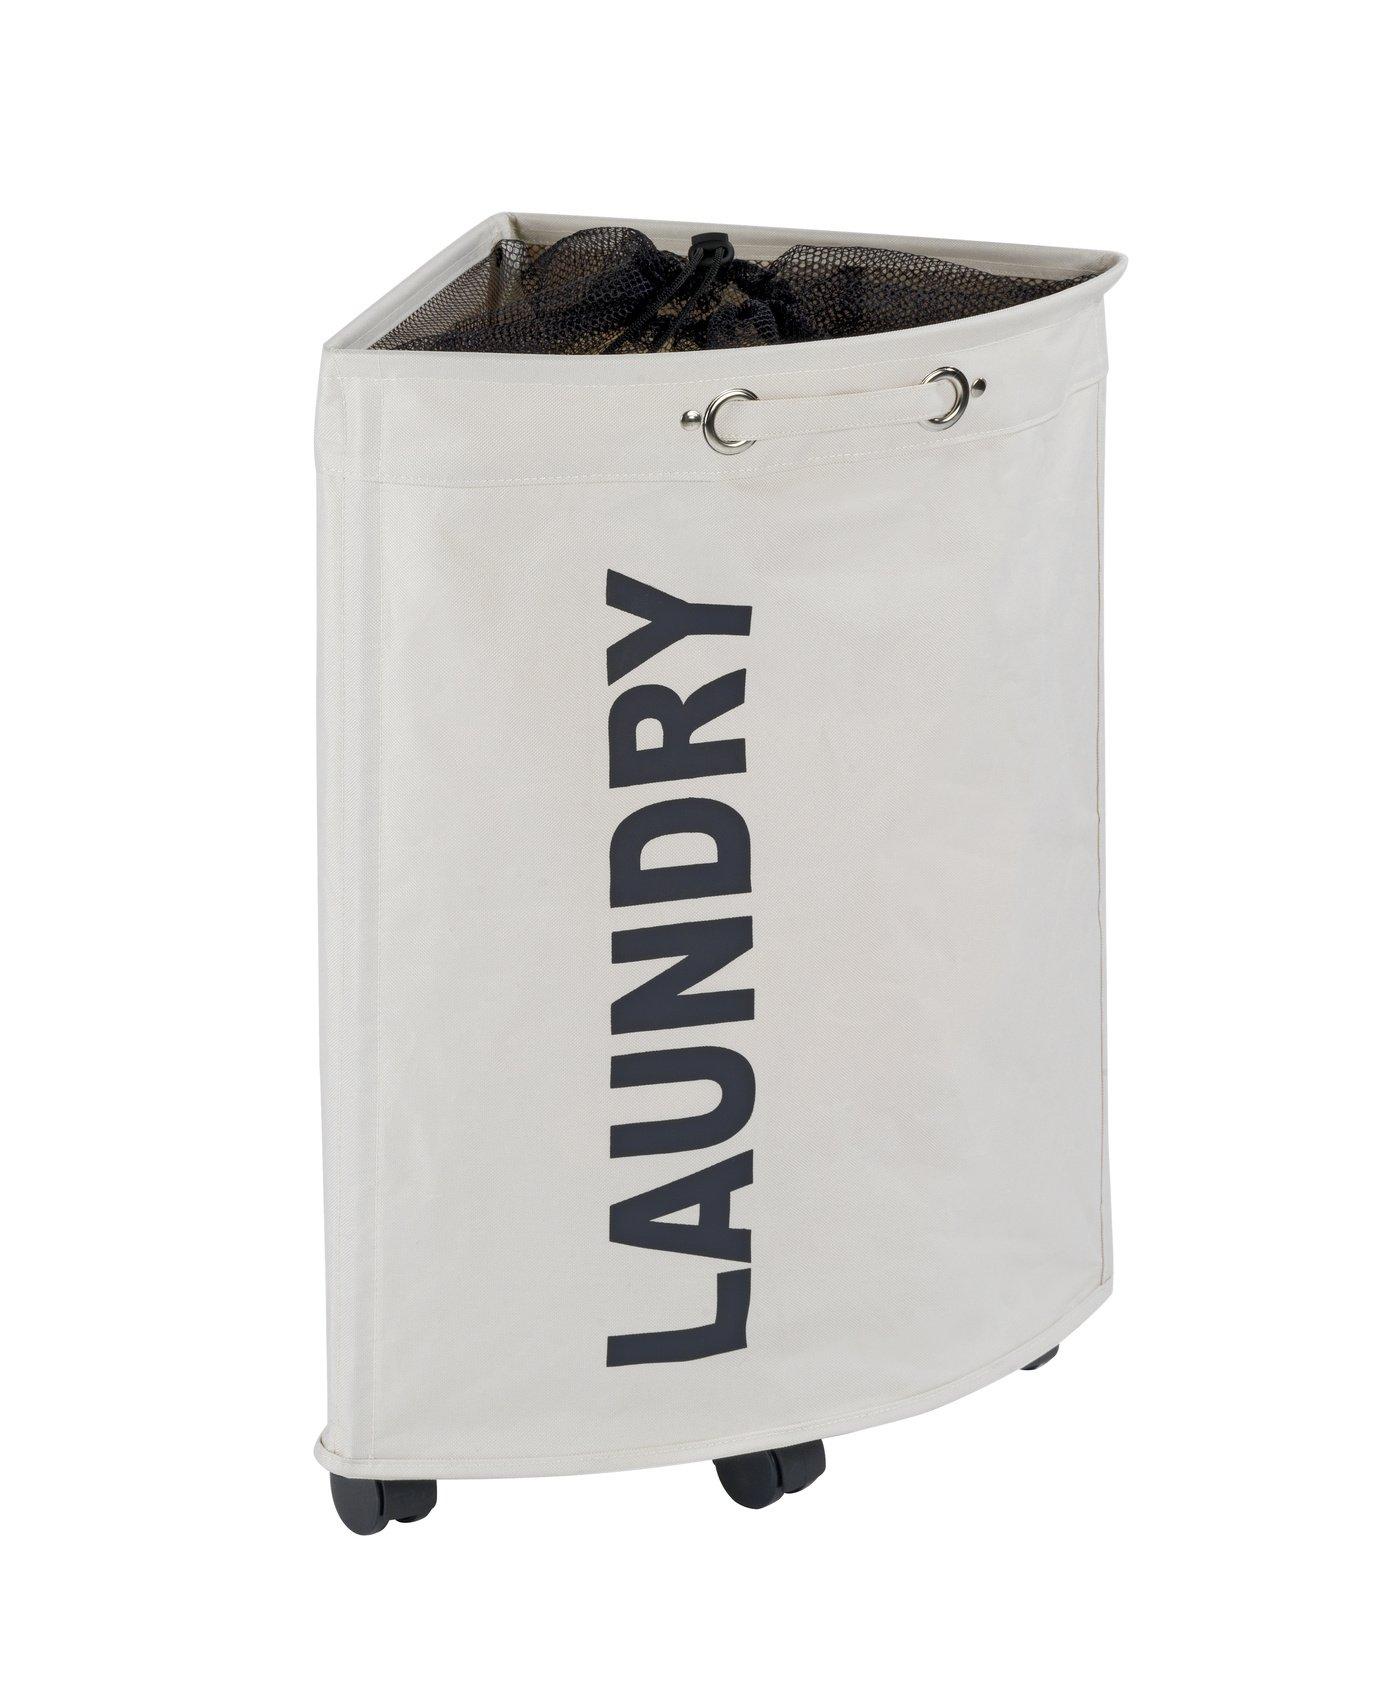 WENKO Tresco Laundry Bin, 13.21 gallon/13'' x 23.6'' x 13'', Beige by WENKO